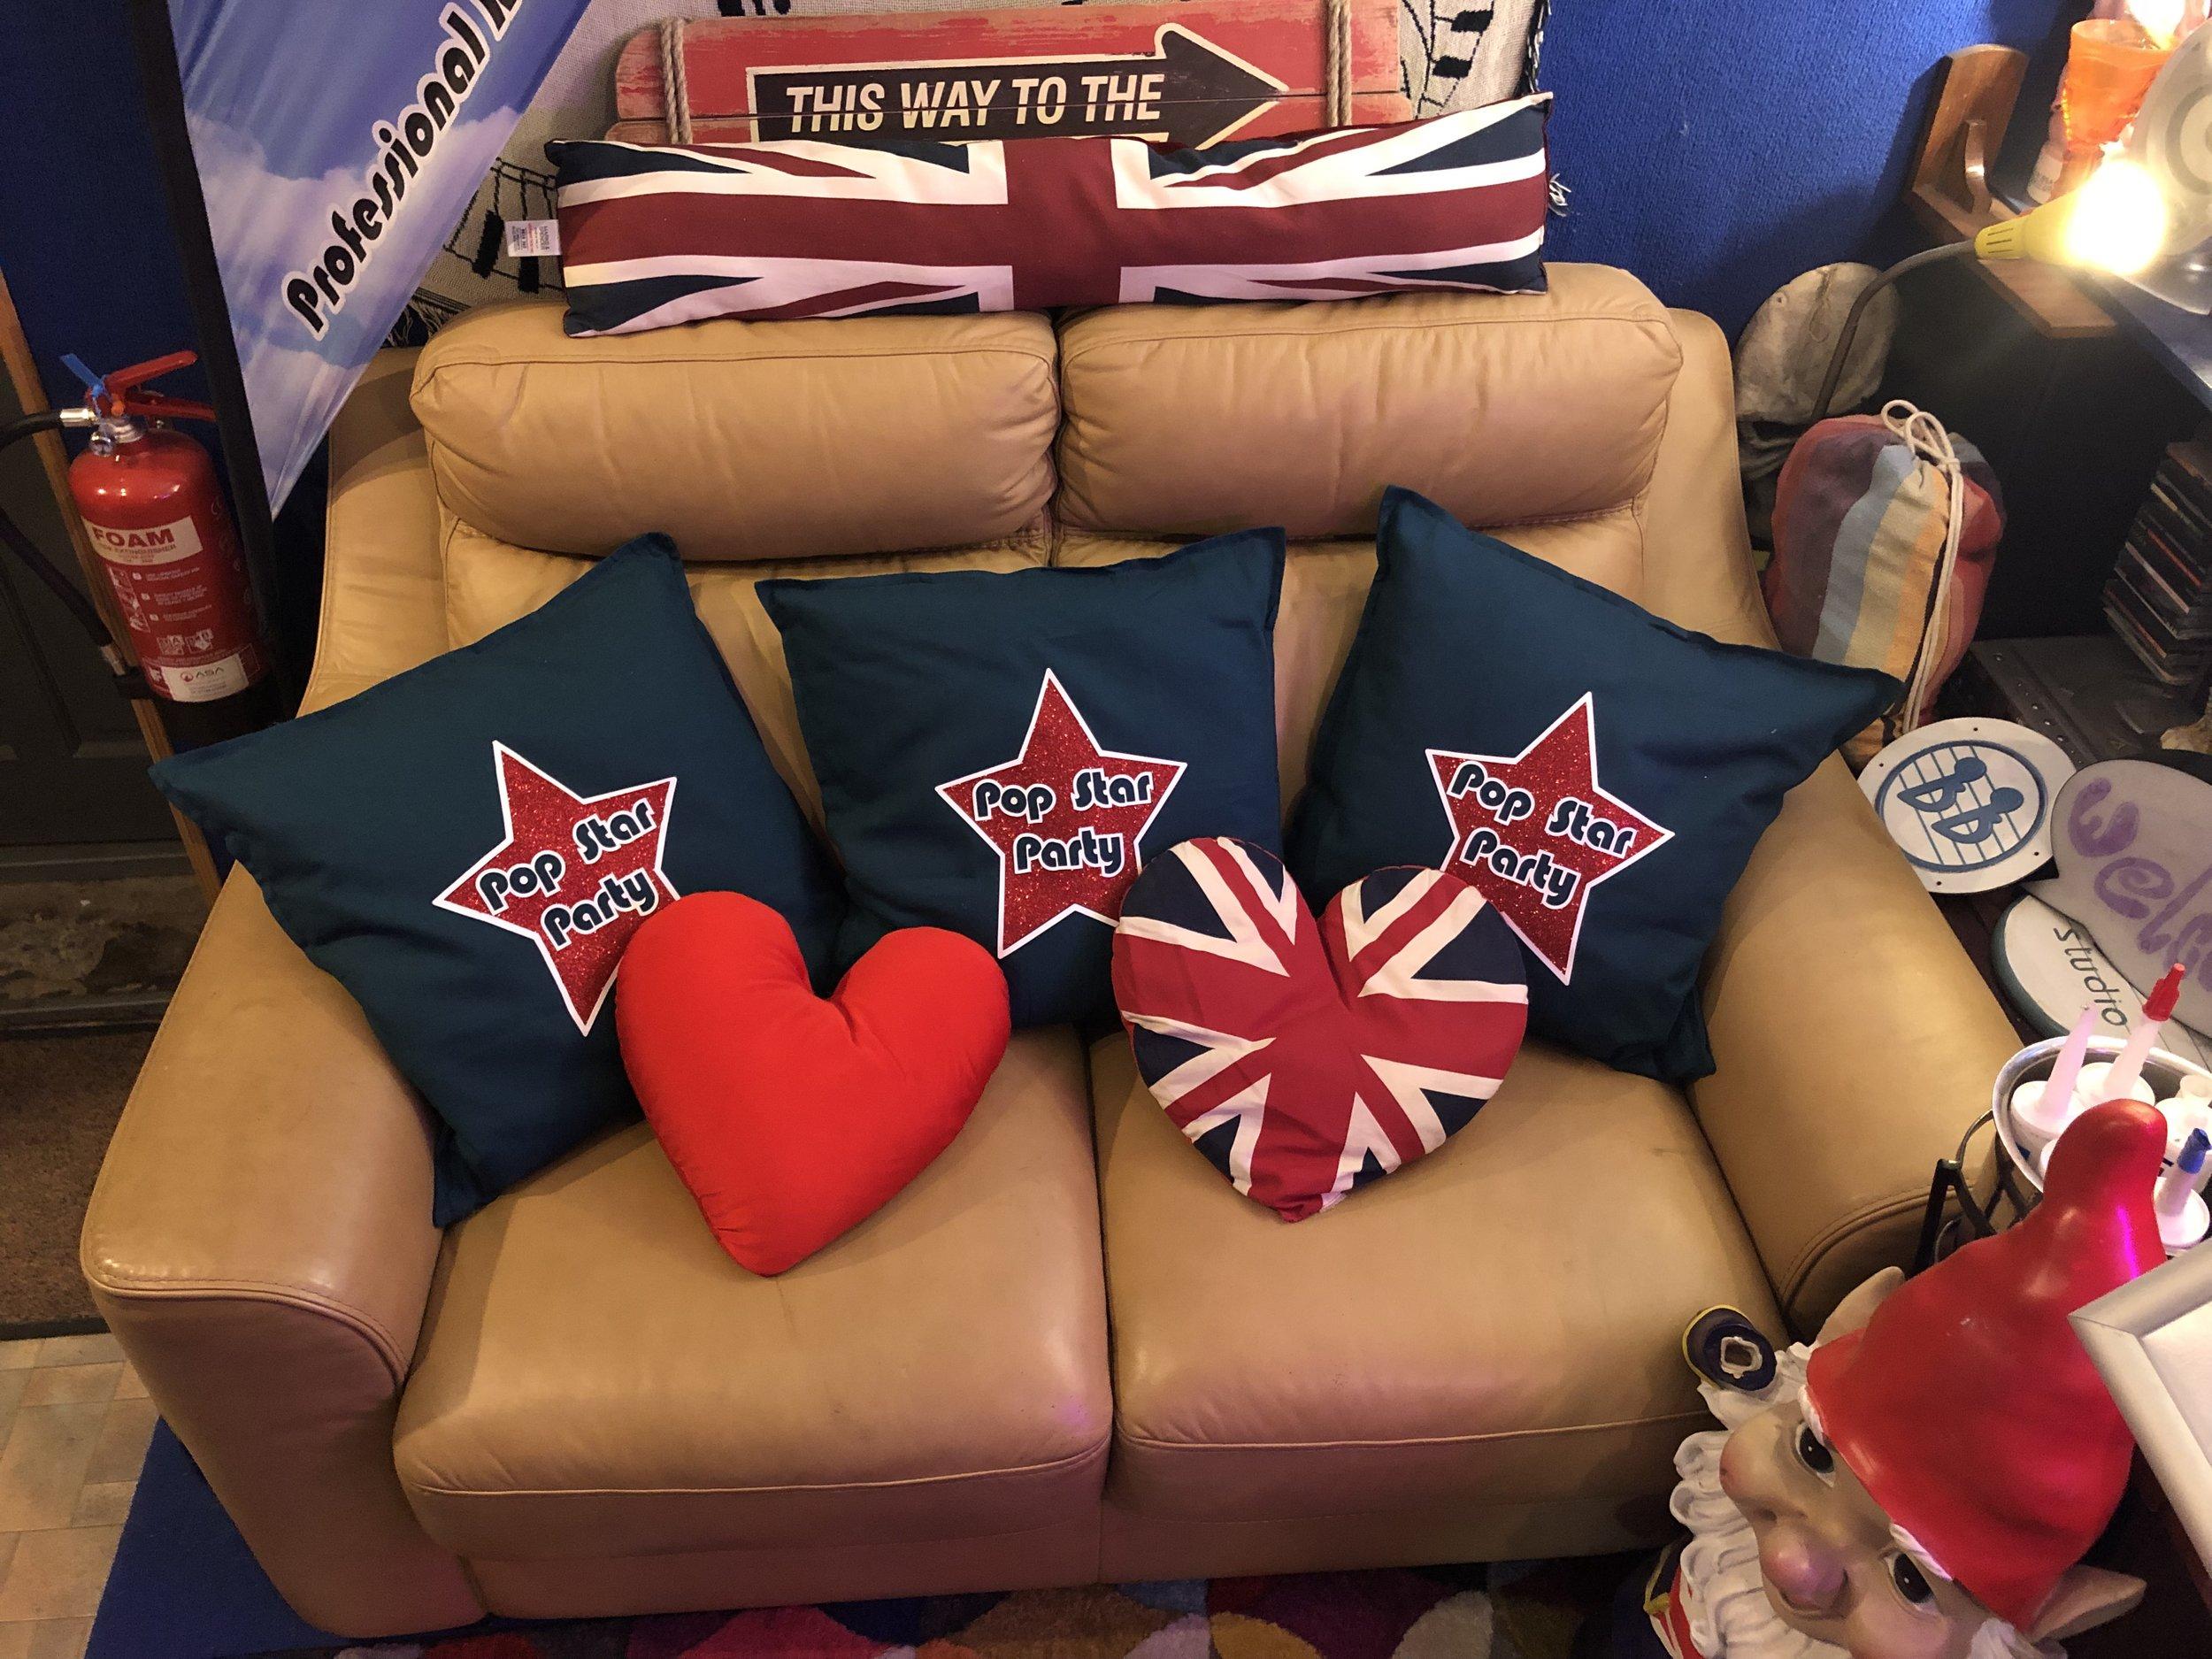 Pop Star Party - cushions.jpeg